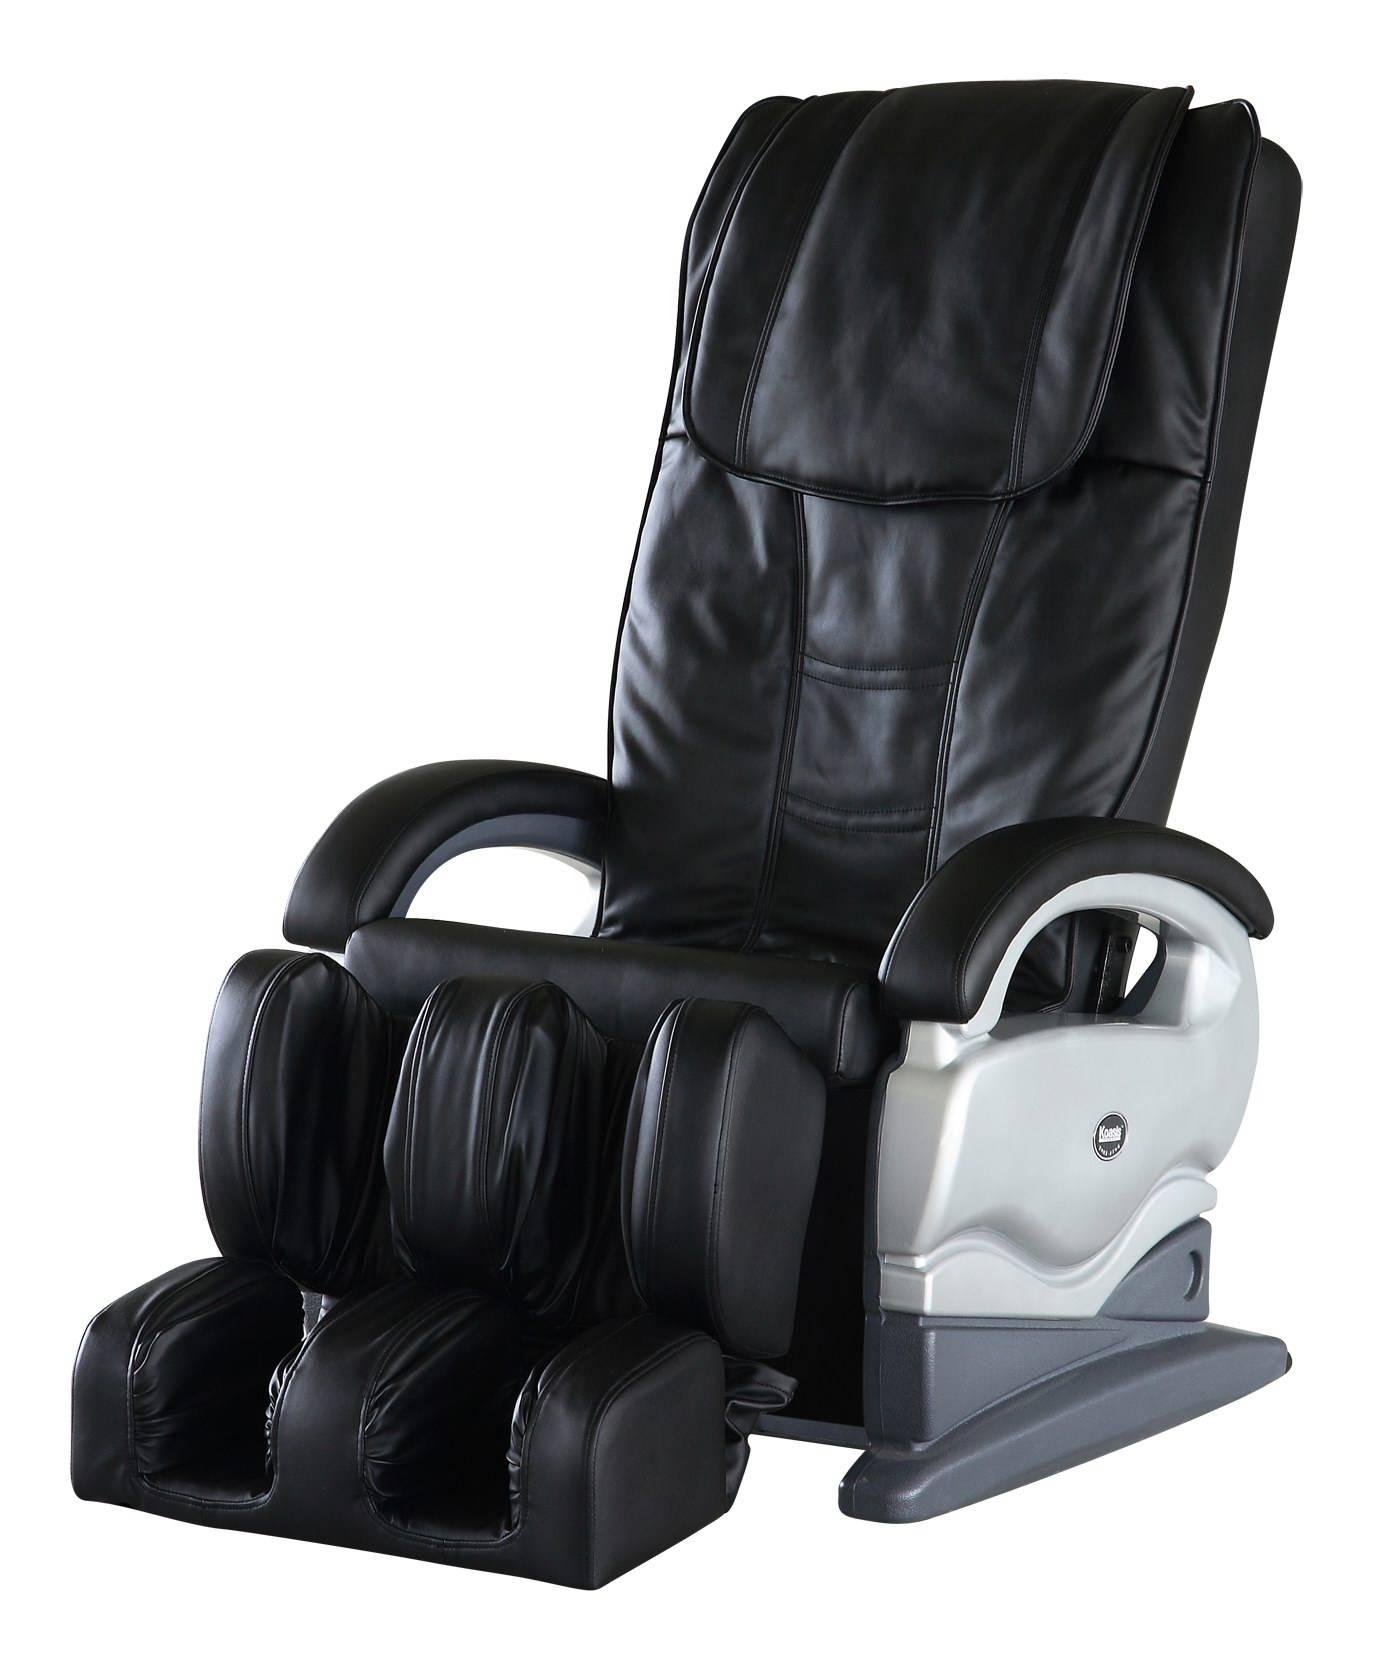 massage chair - FUAN ROVOS FITNESS Co., Ltd.